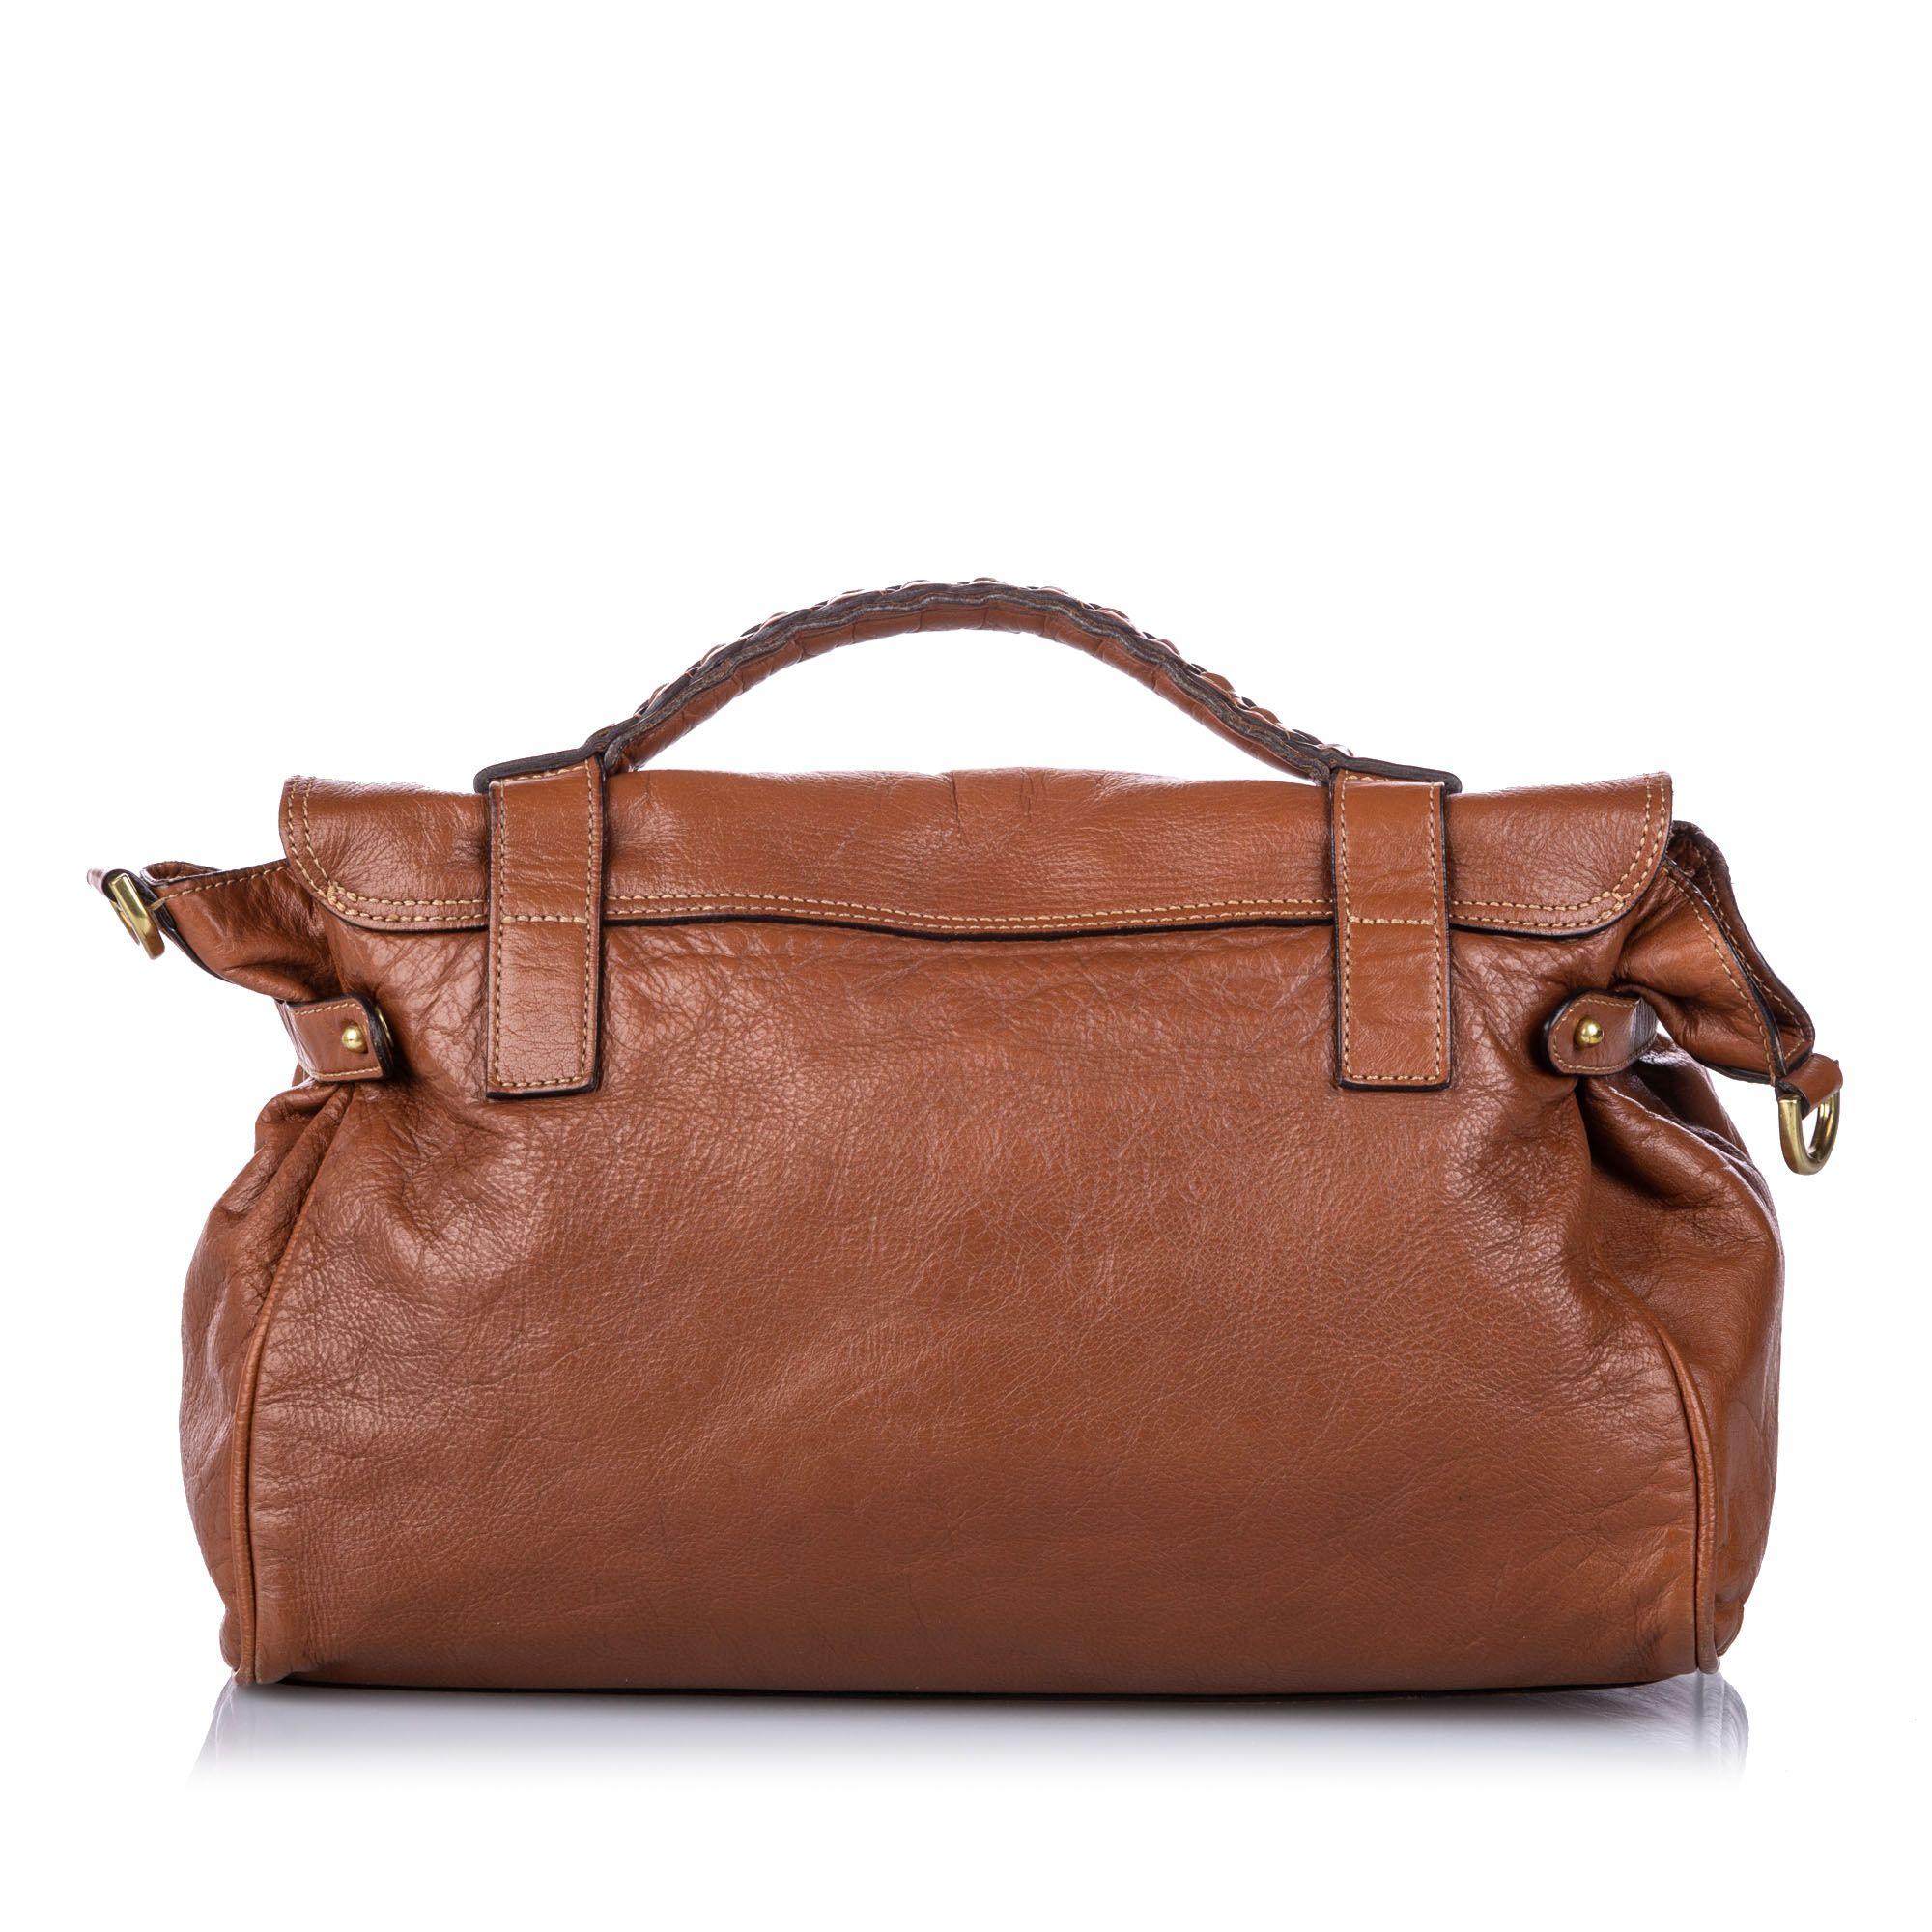 Vintage Mulberry Leather Alexa Satchel Brown